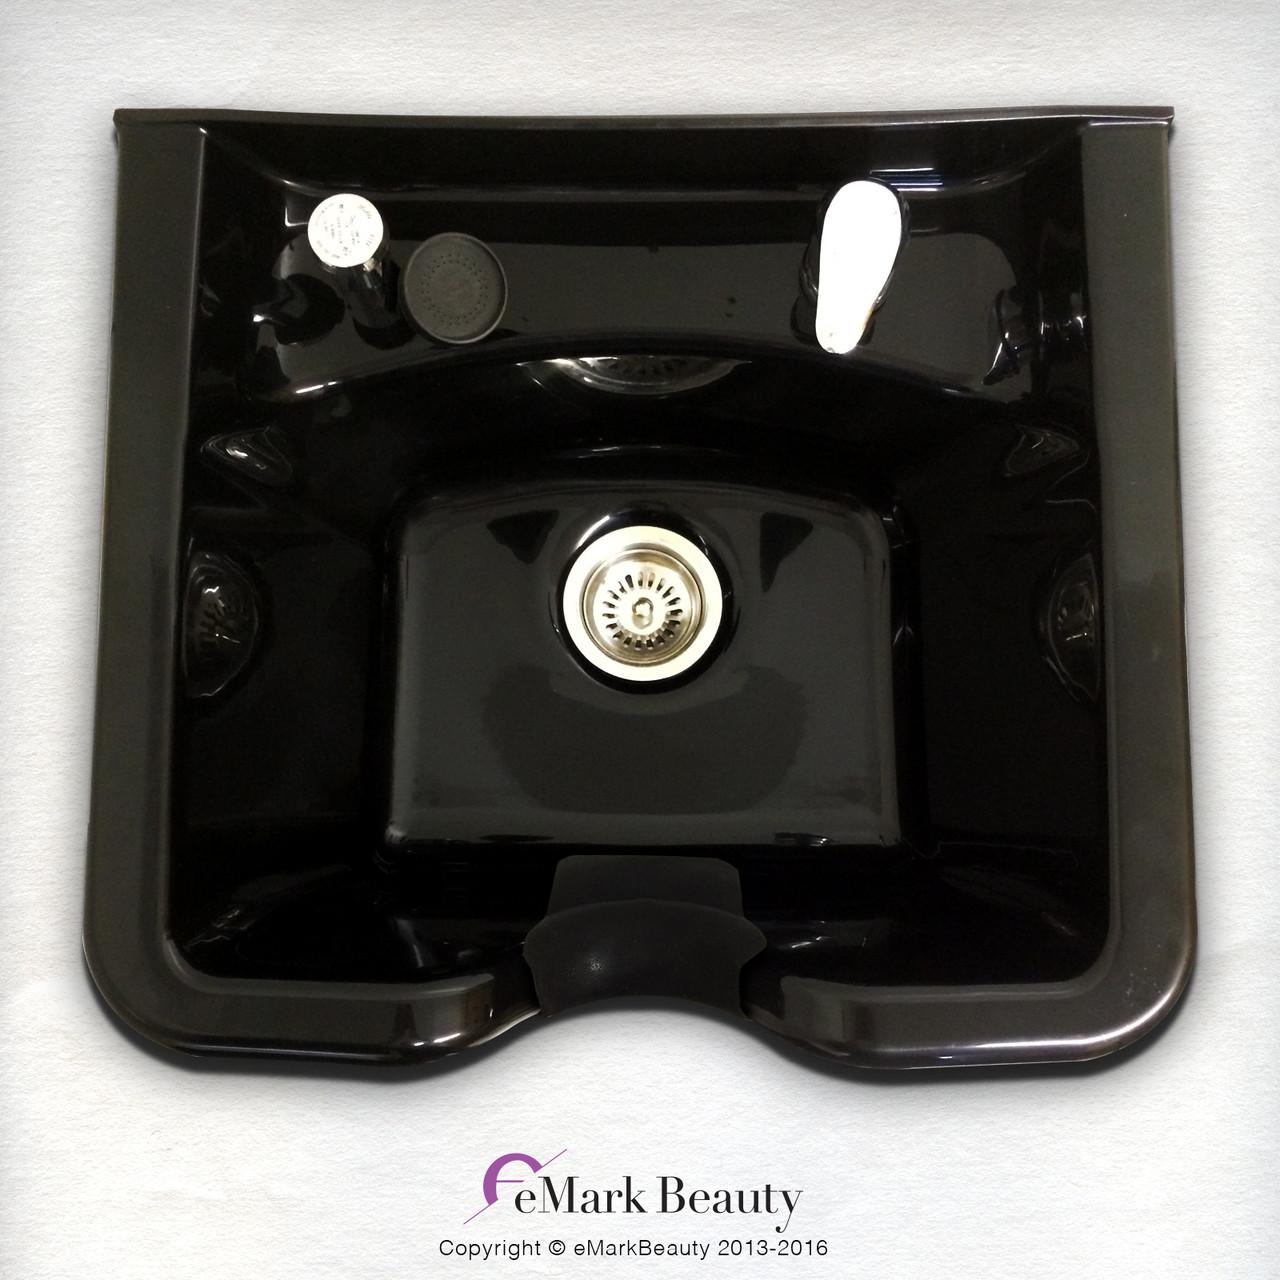 Extra Wide Square ABS Plastic Shampoo Bowl TLC-B22 KSGT